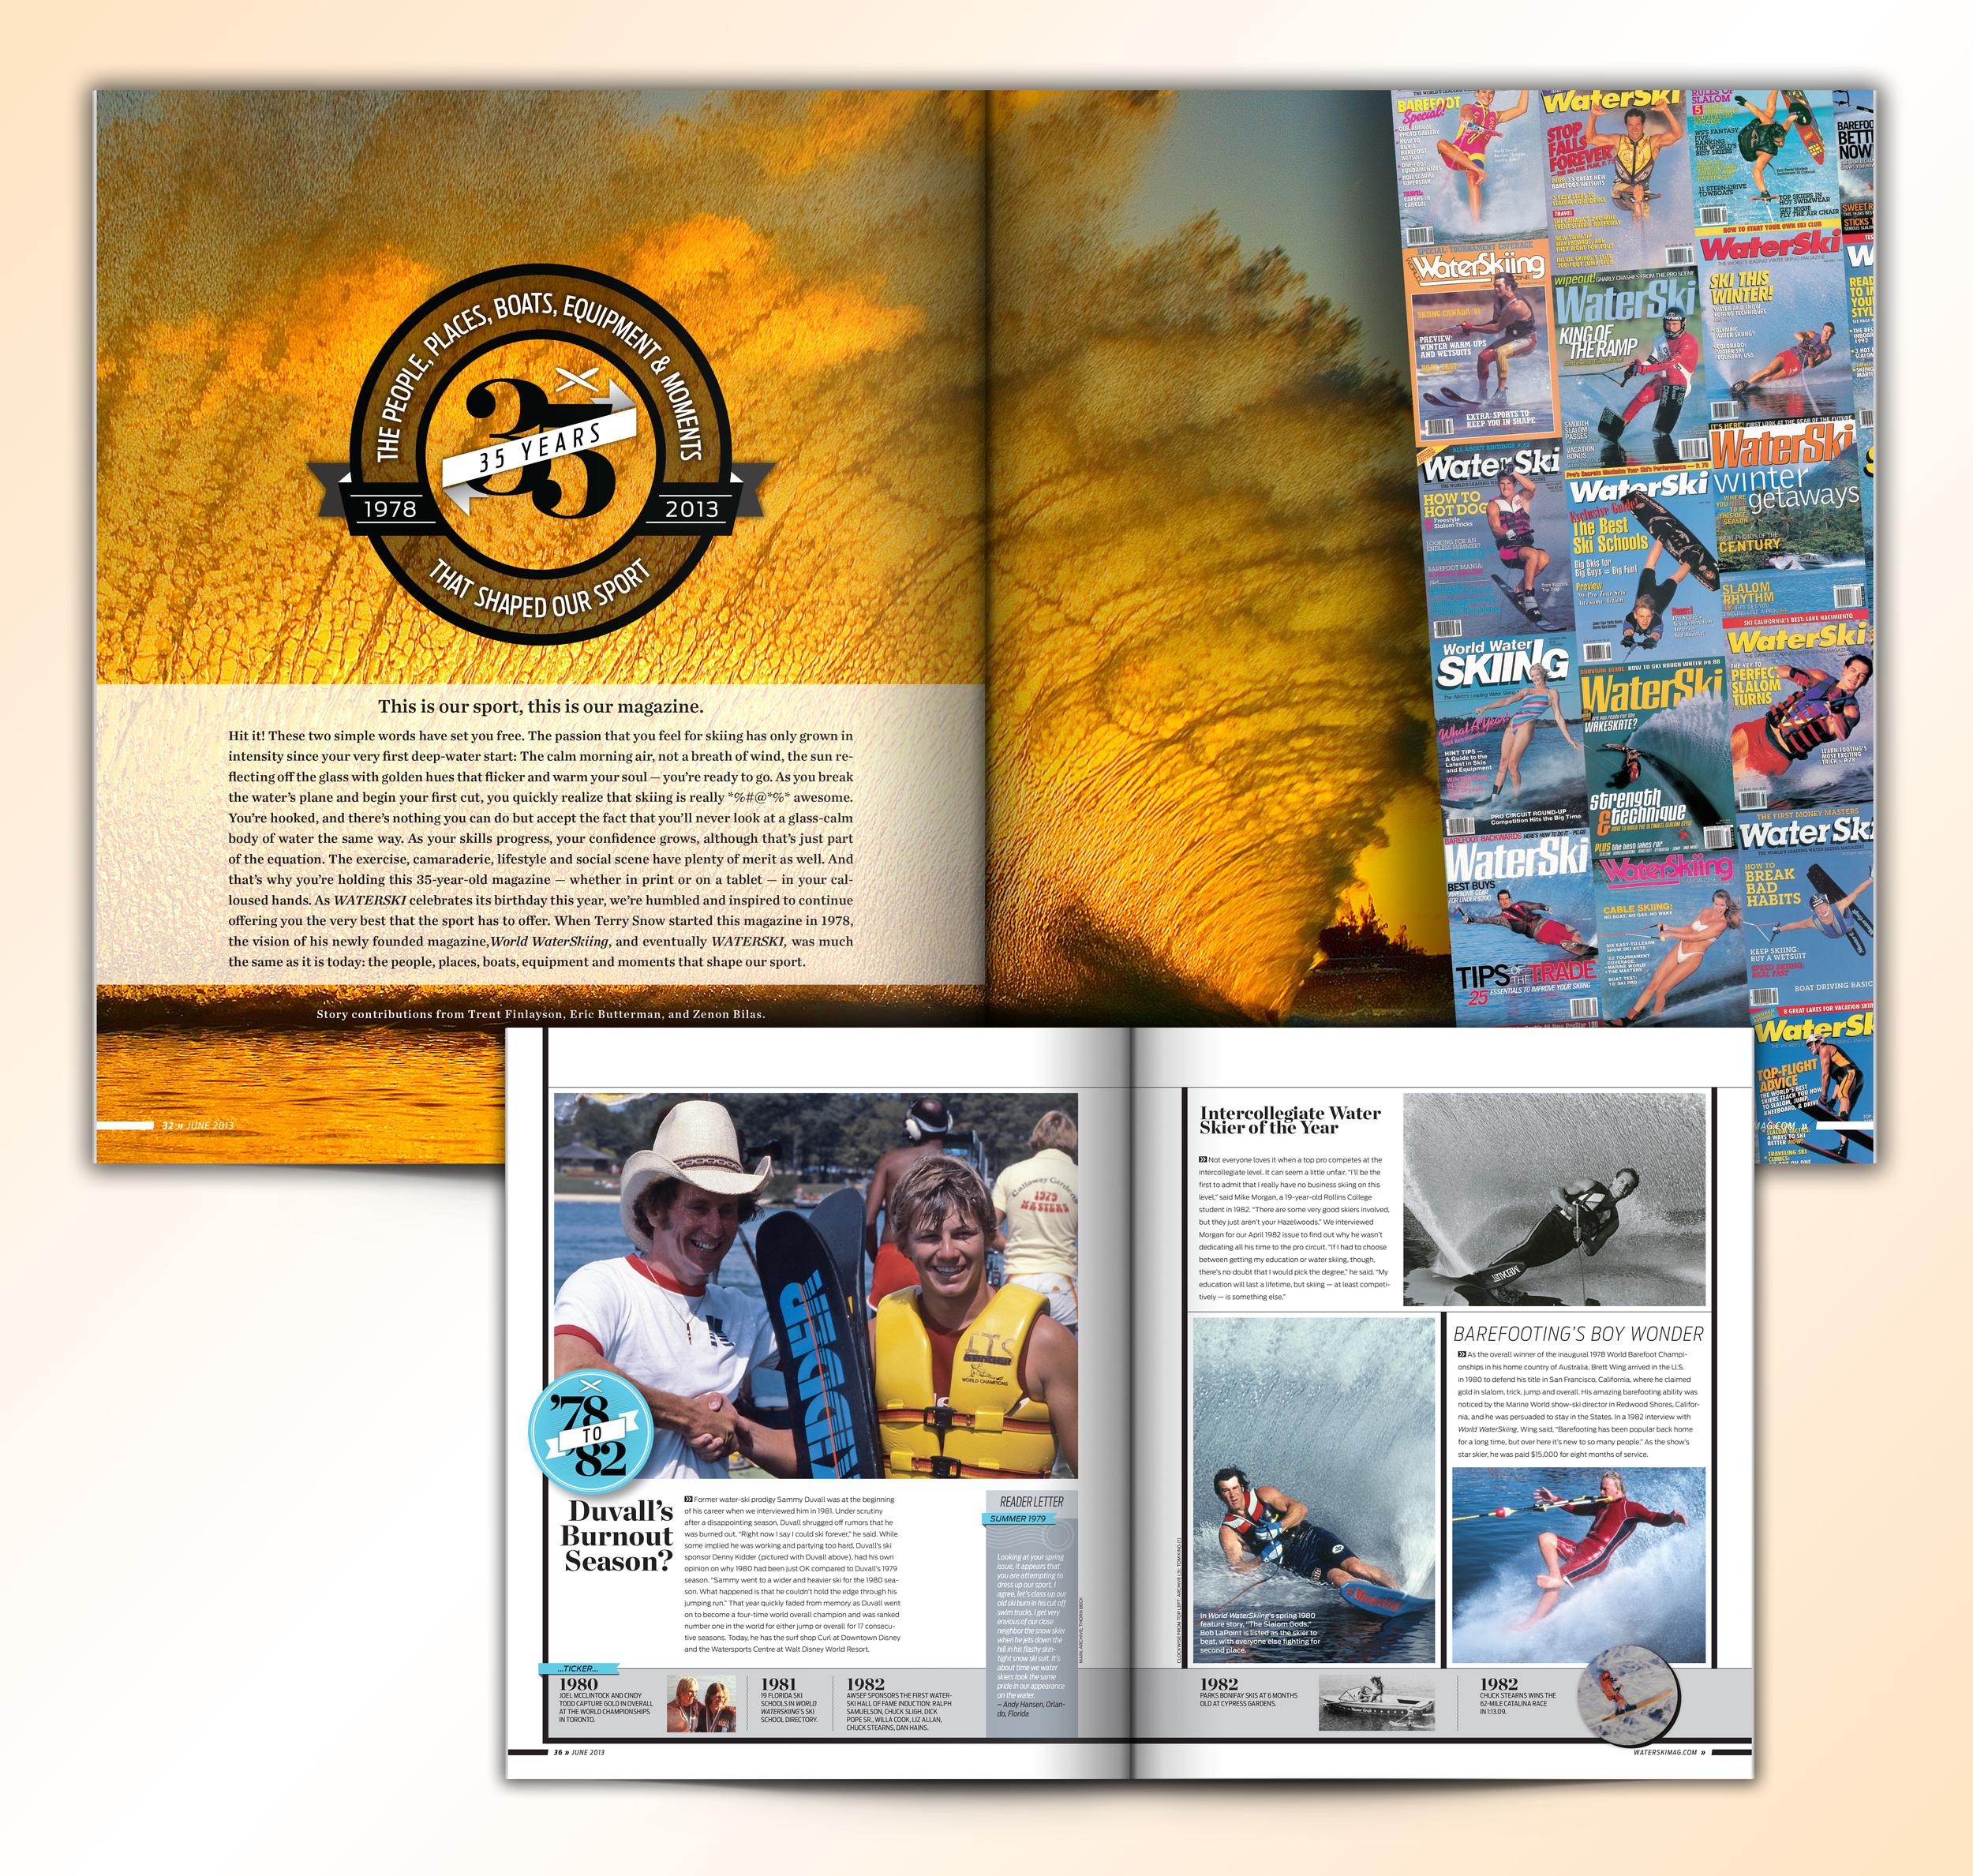 Waterski_Magazine_pages_layout_4.jpg